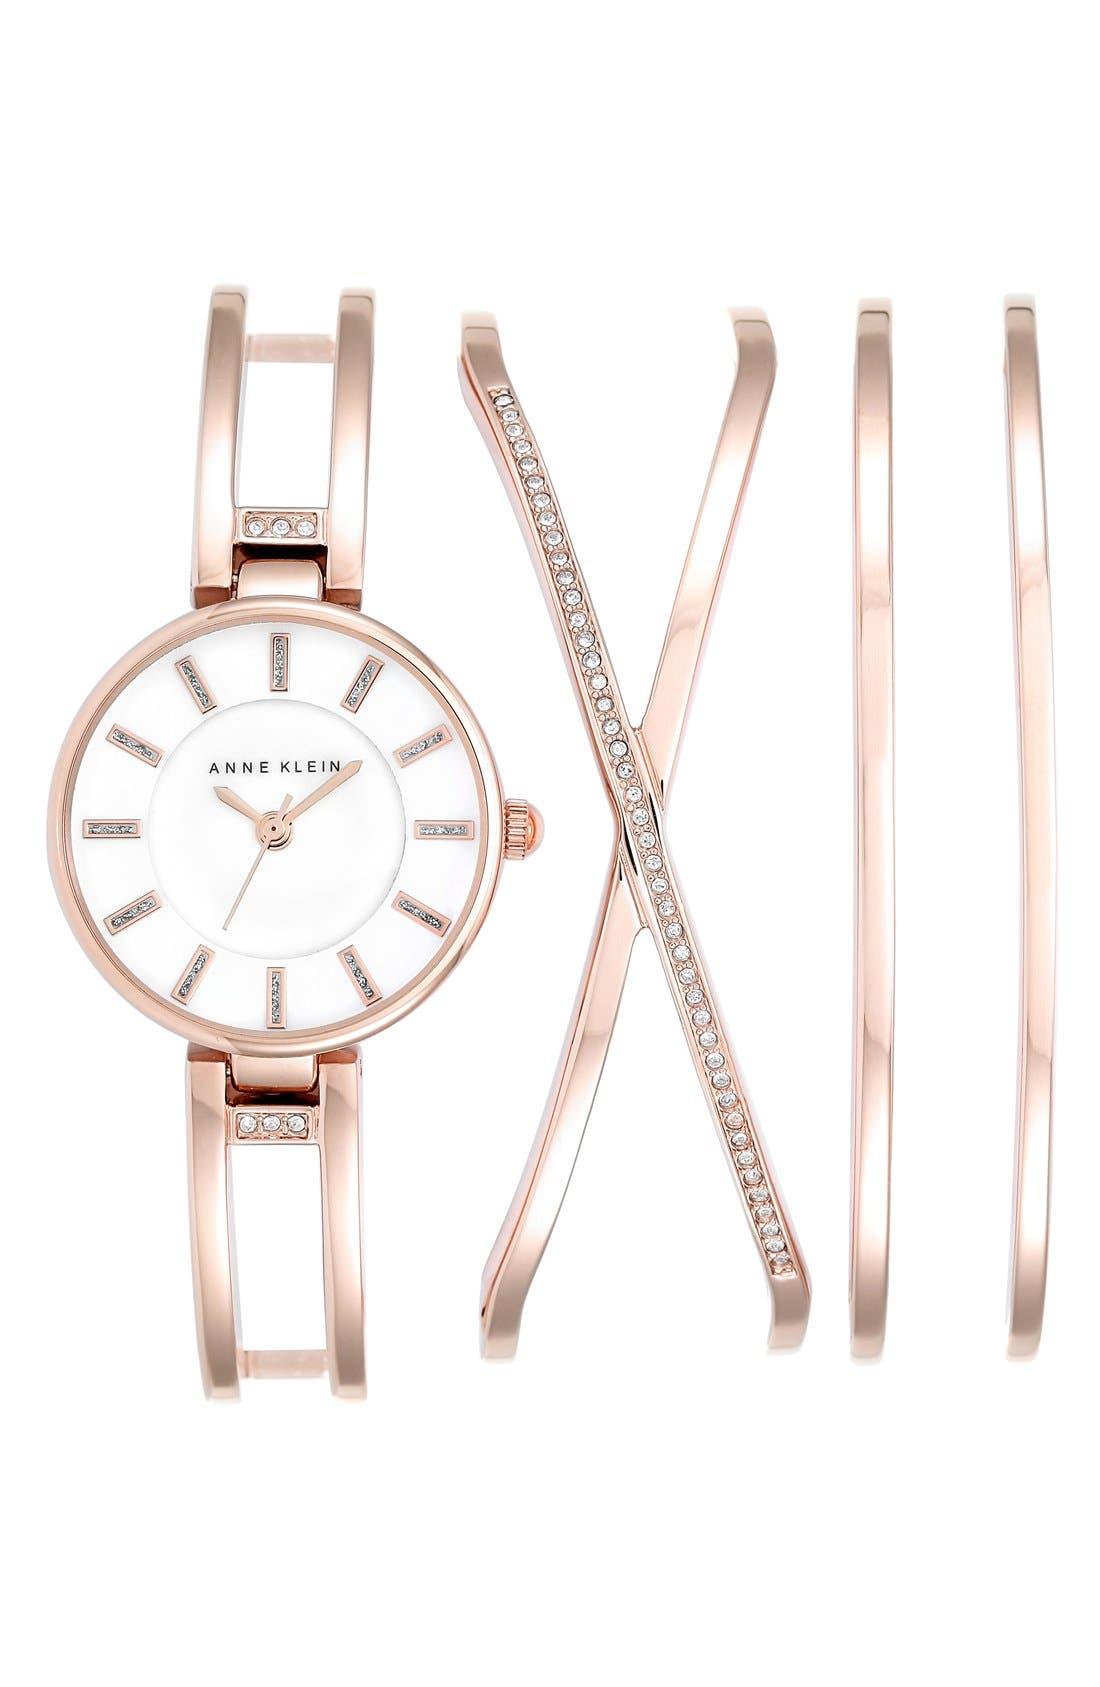 Main Image - Anne Klein Boxed Bracelet & Bangle Watch Set, 26mm